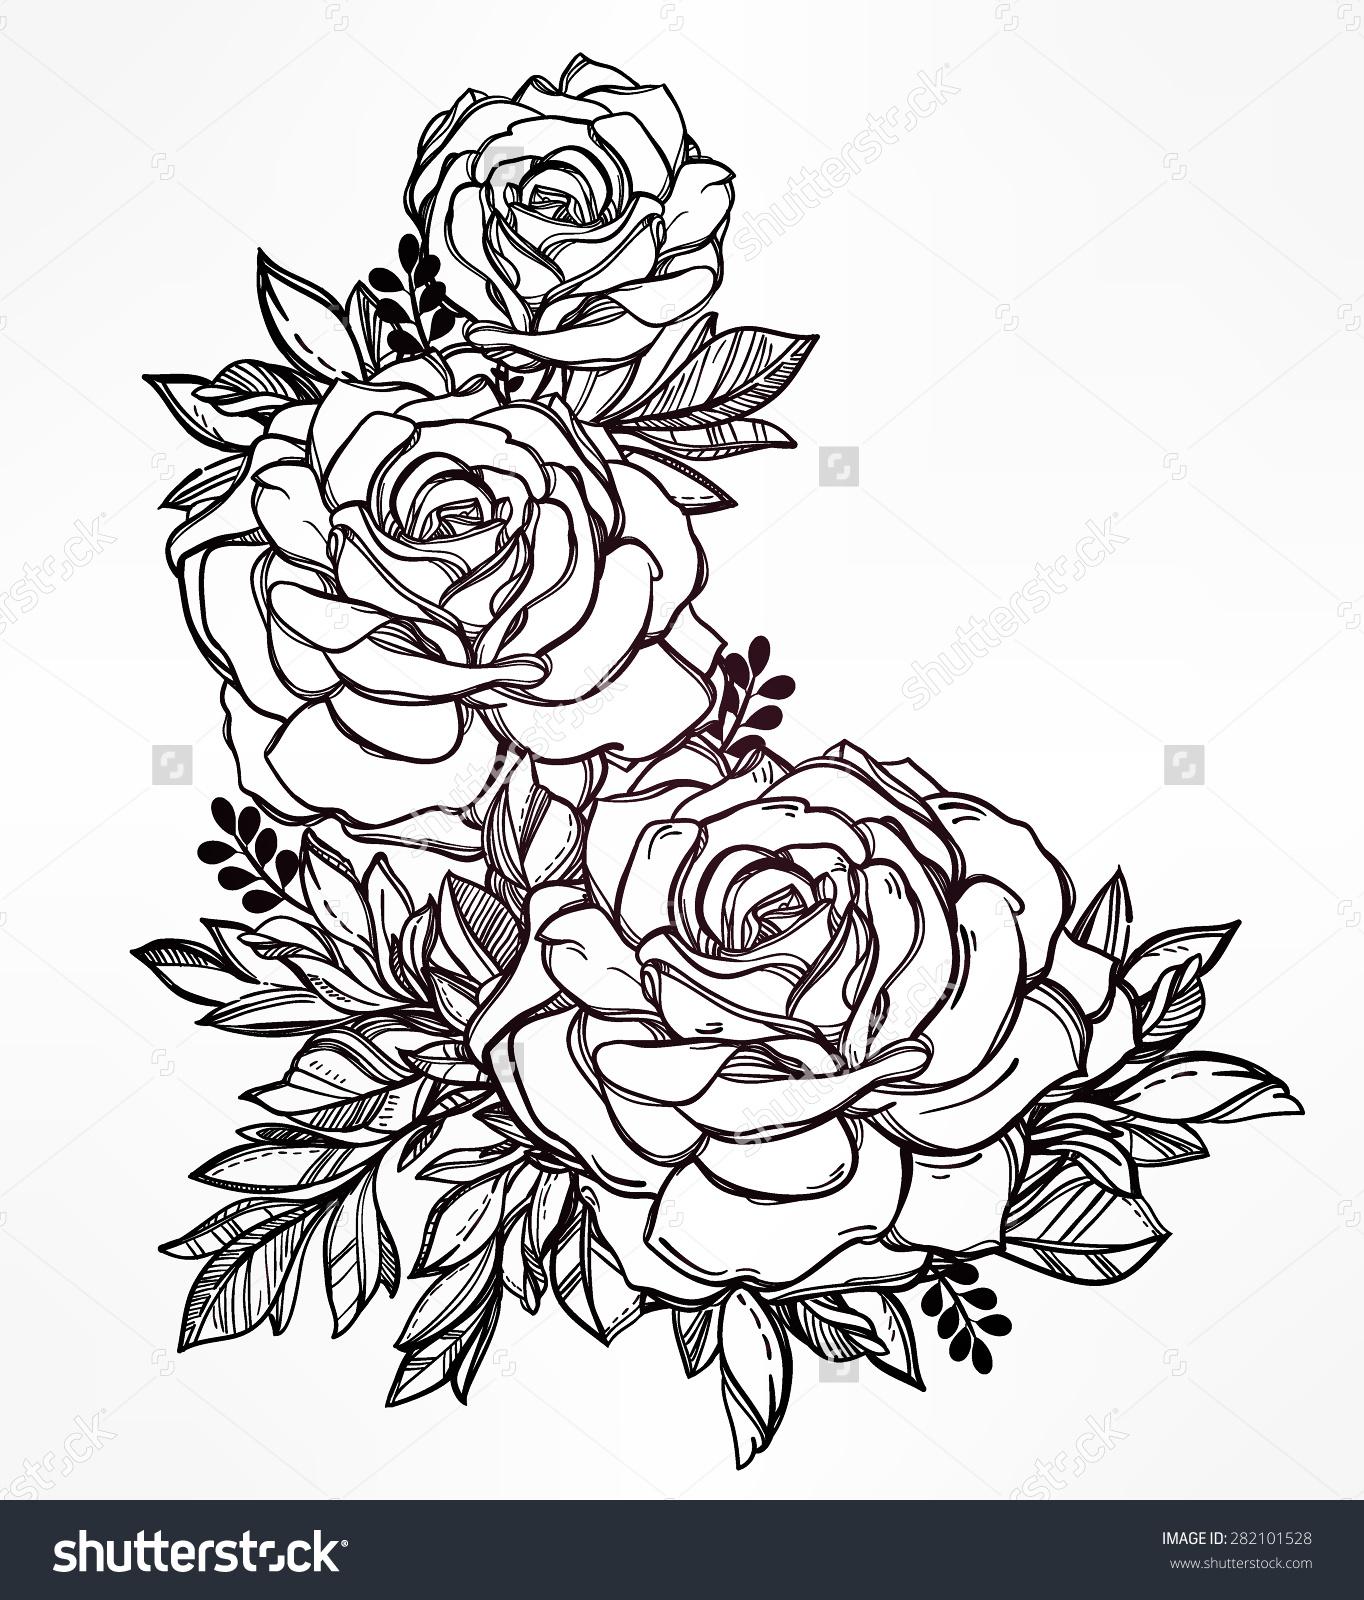 Drawn vintage flower free hand drawing Motif roses flower stem highly